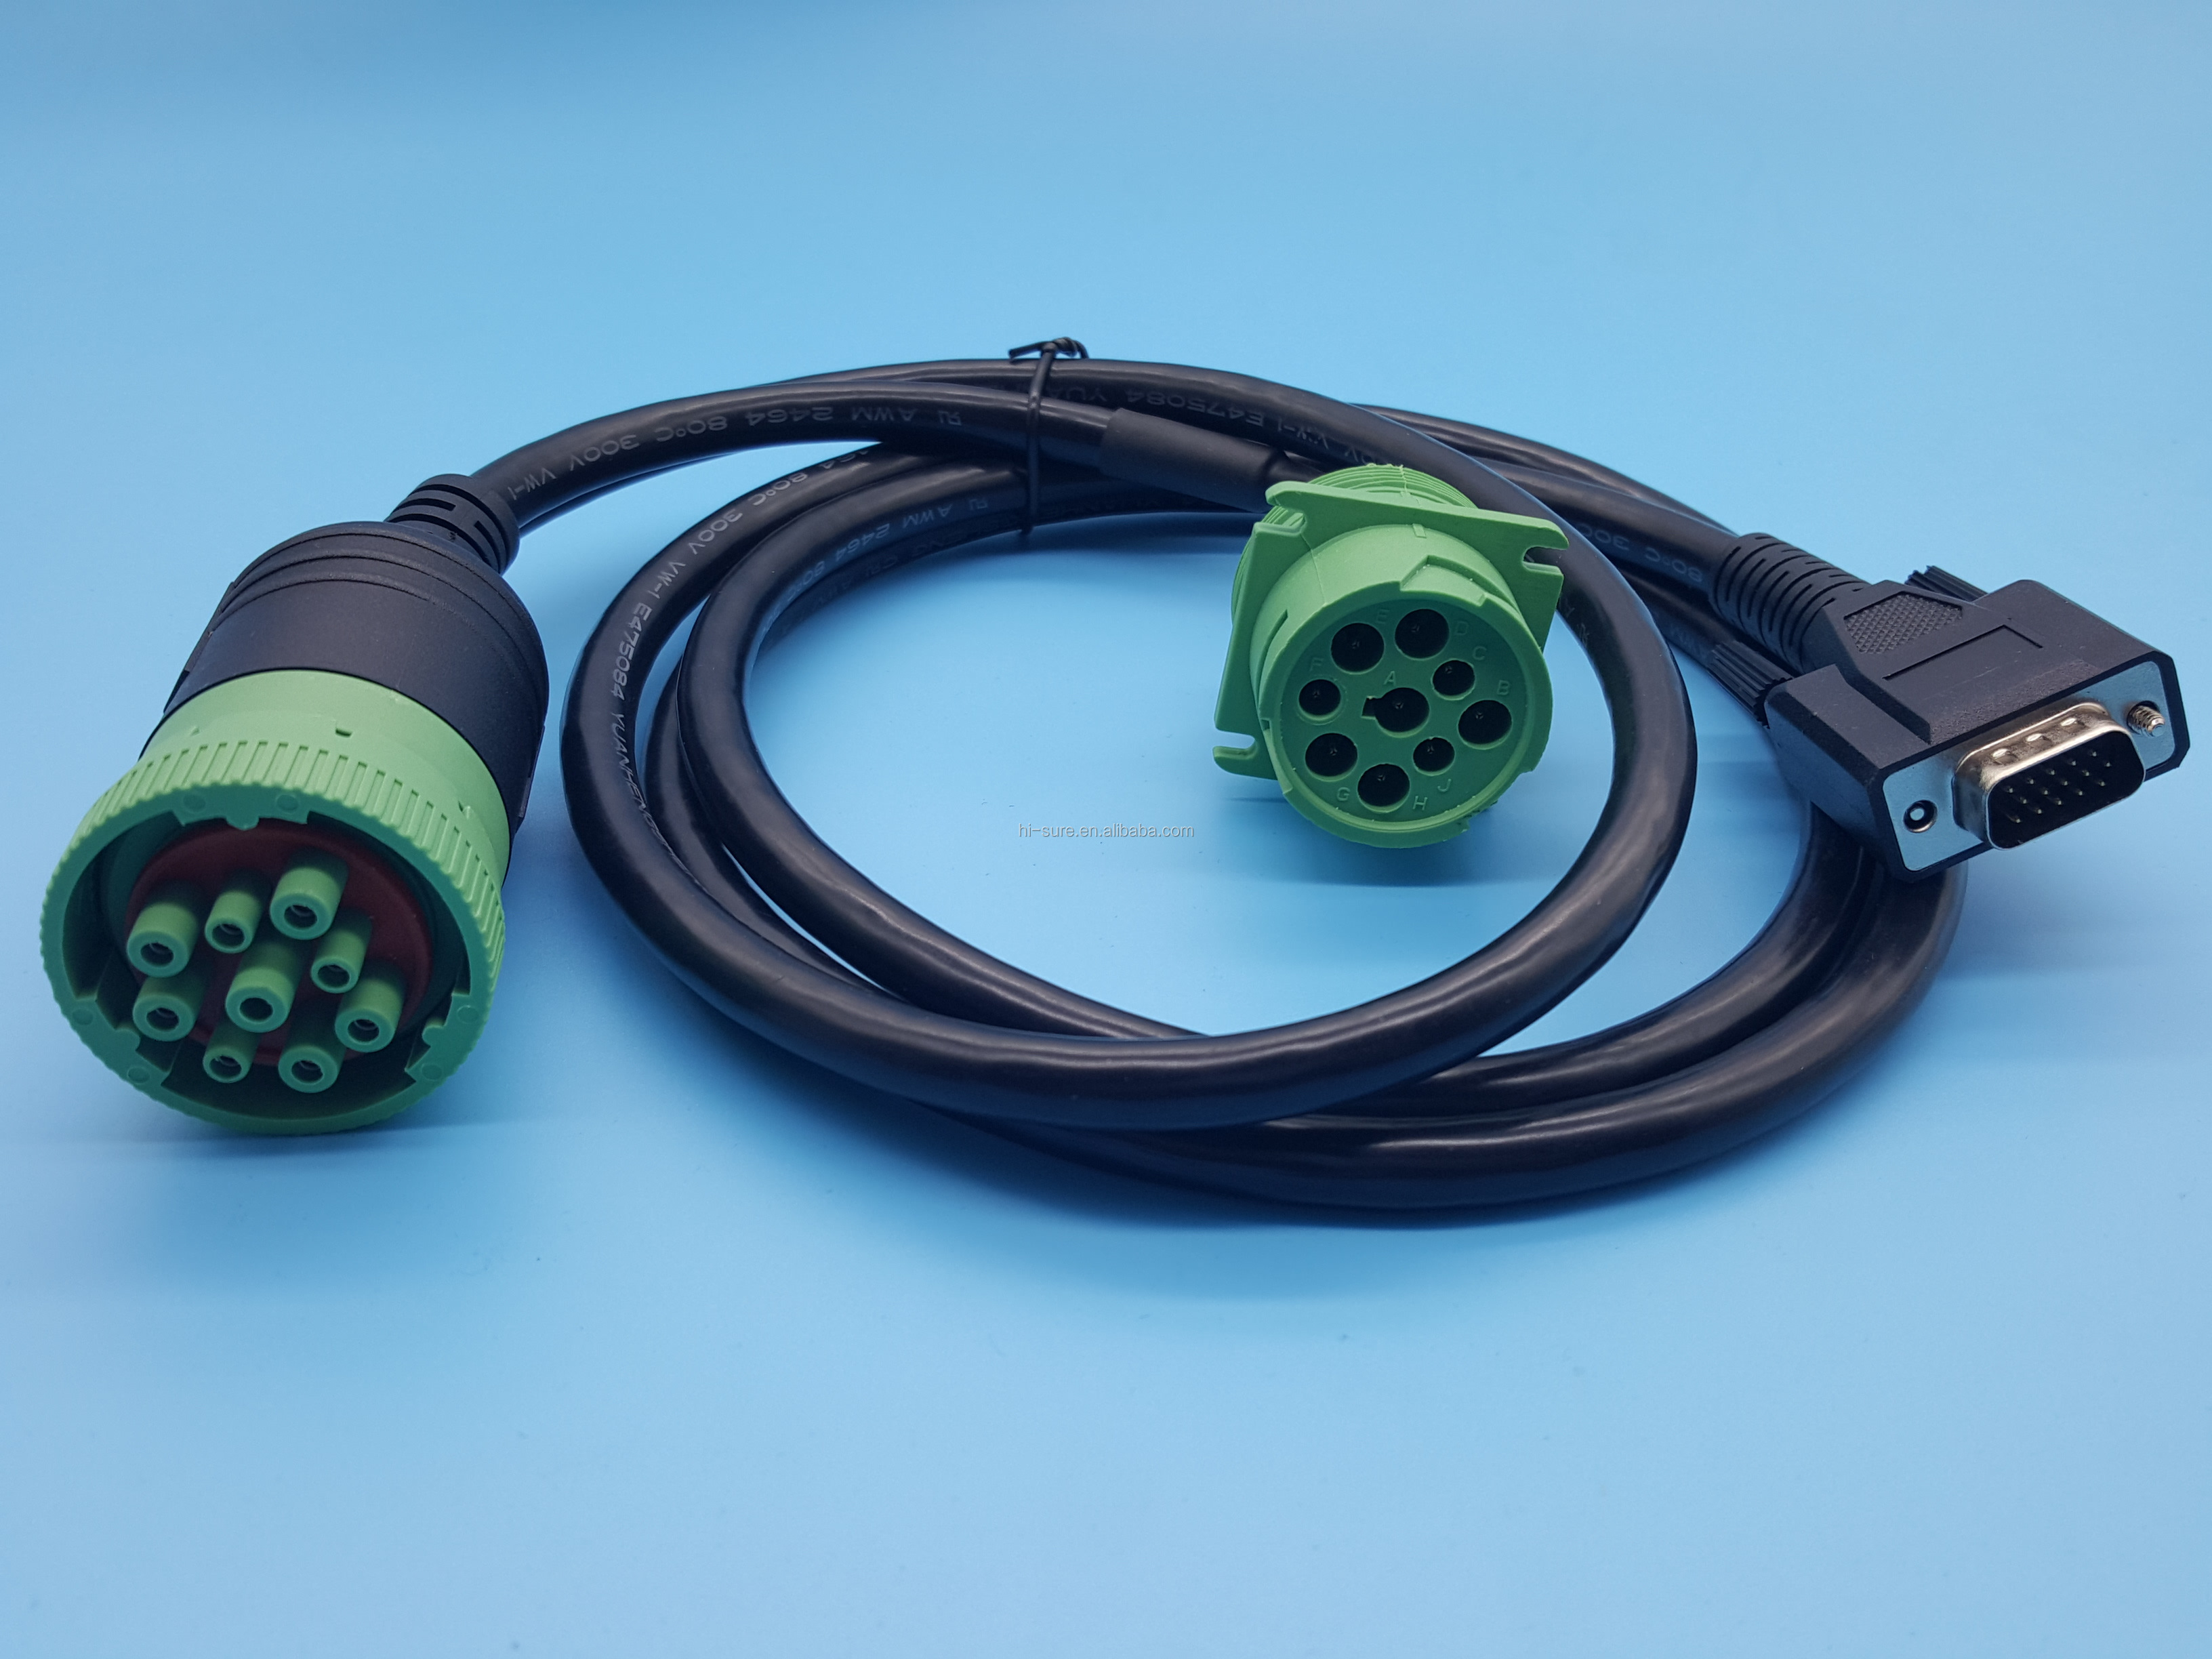 Deutsch 9 Pin Wire Harness Connector J1939 To J1939 & Db15p Split Y on